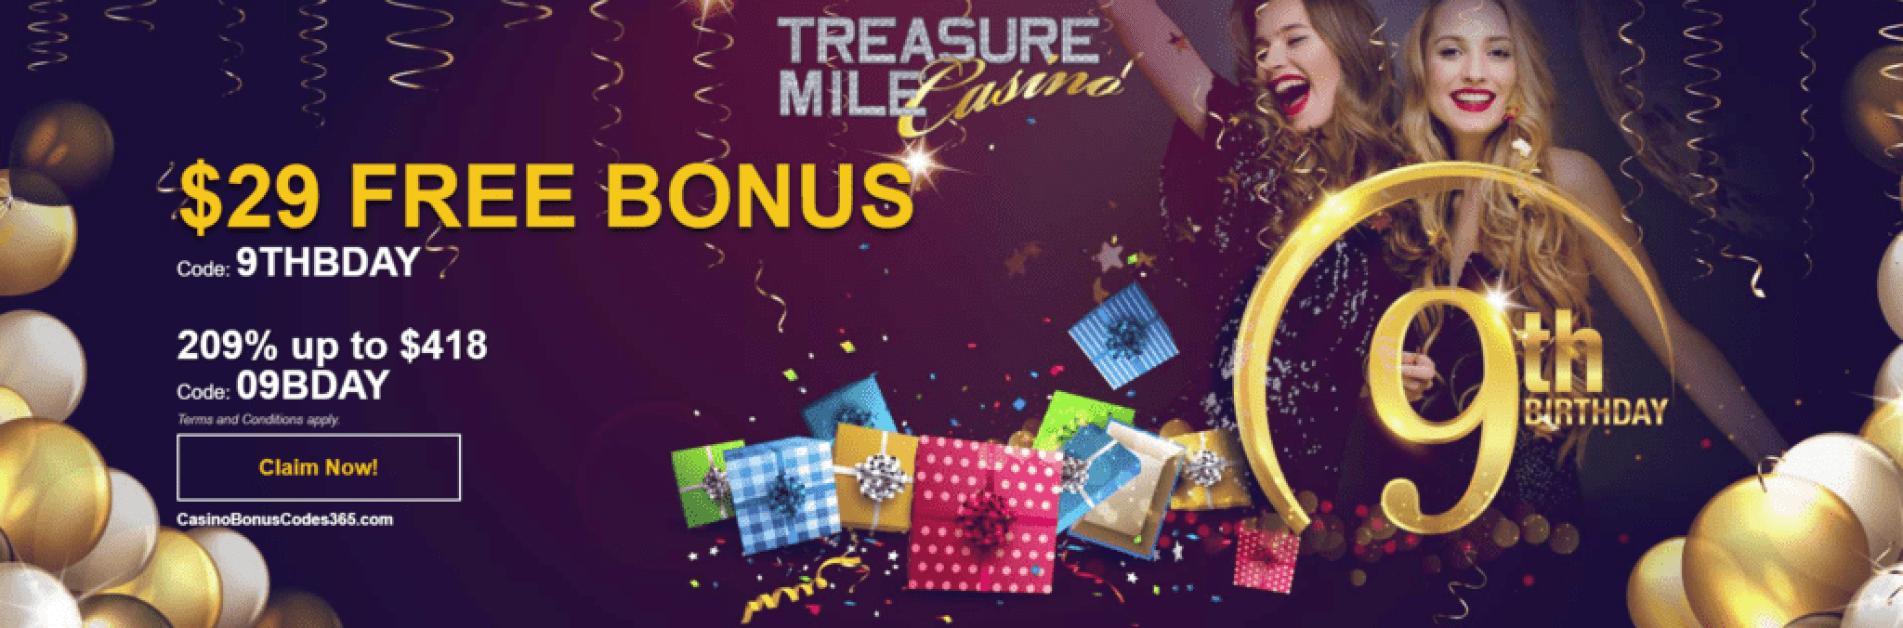 Treasure Mile Casino 9th Birthday Celebration Casino Bonus Codes 365